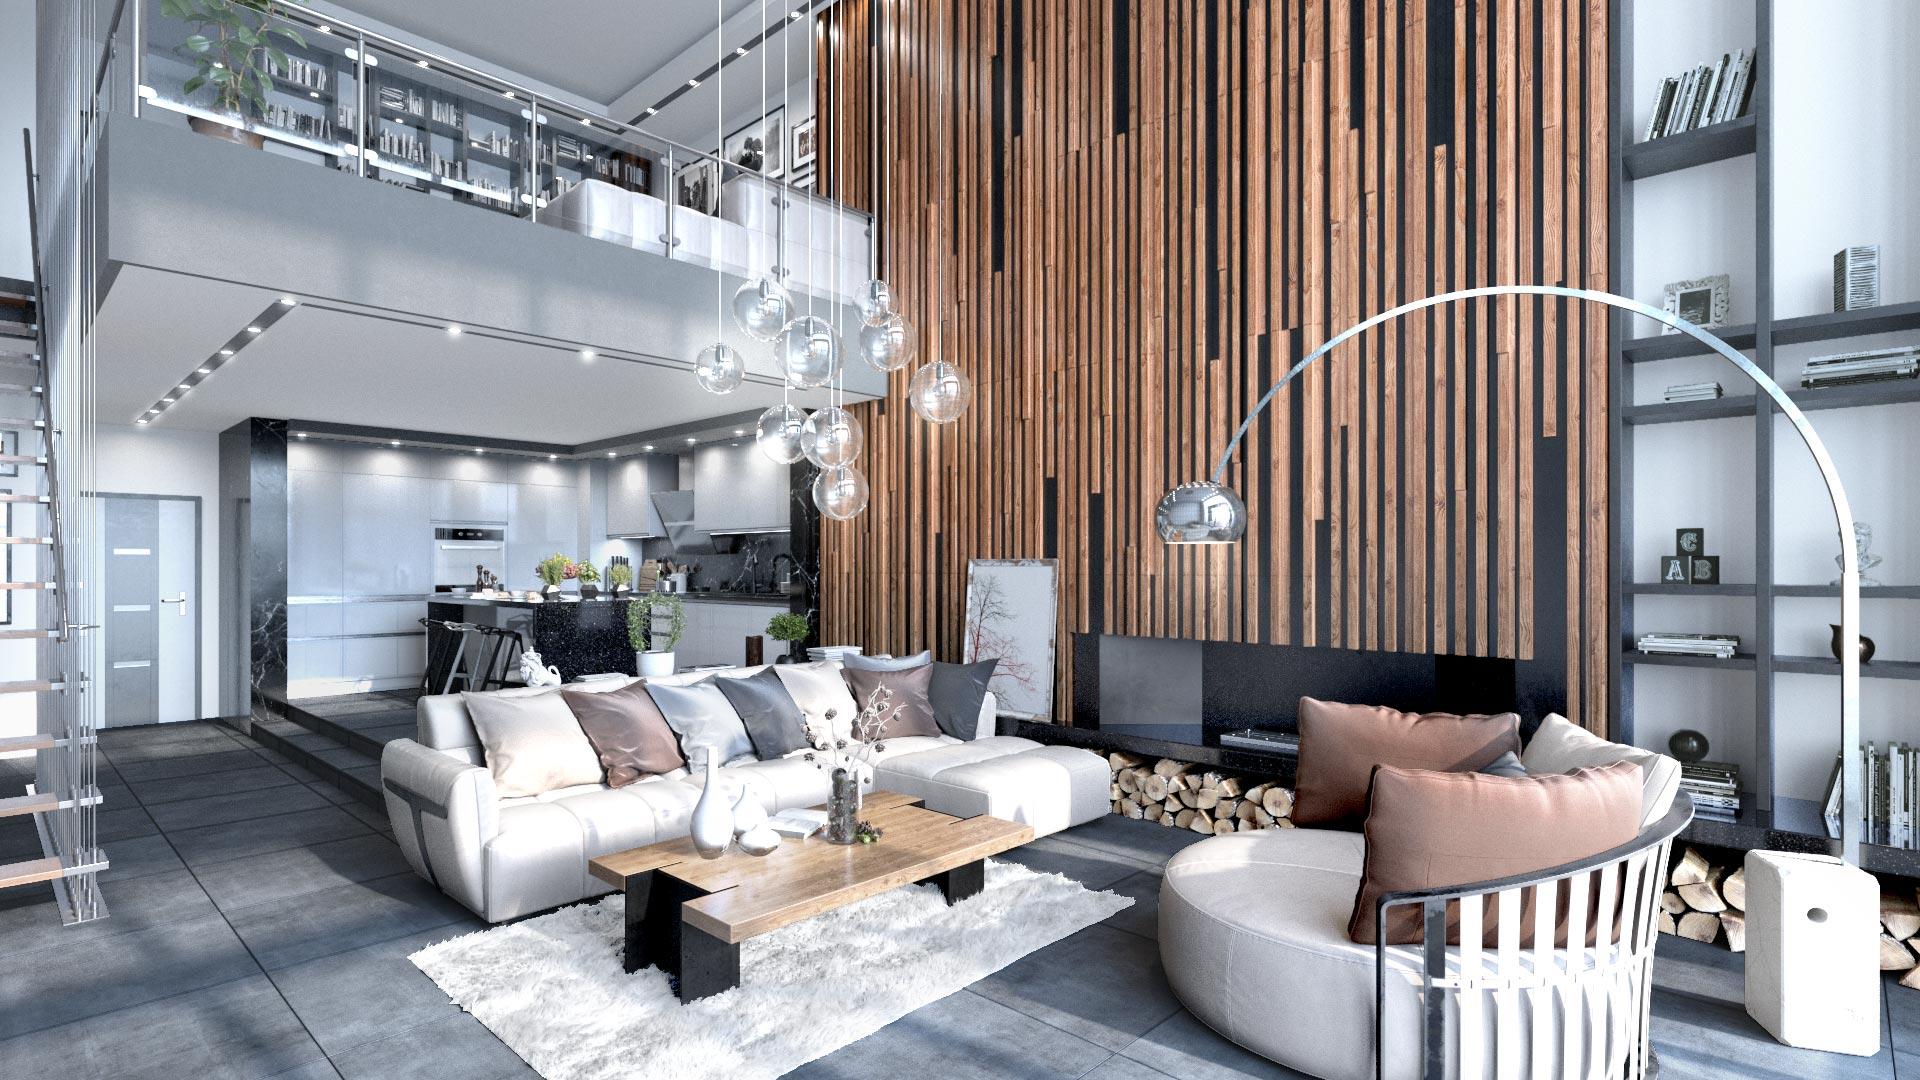 Best Free Software for Interior Design